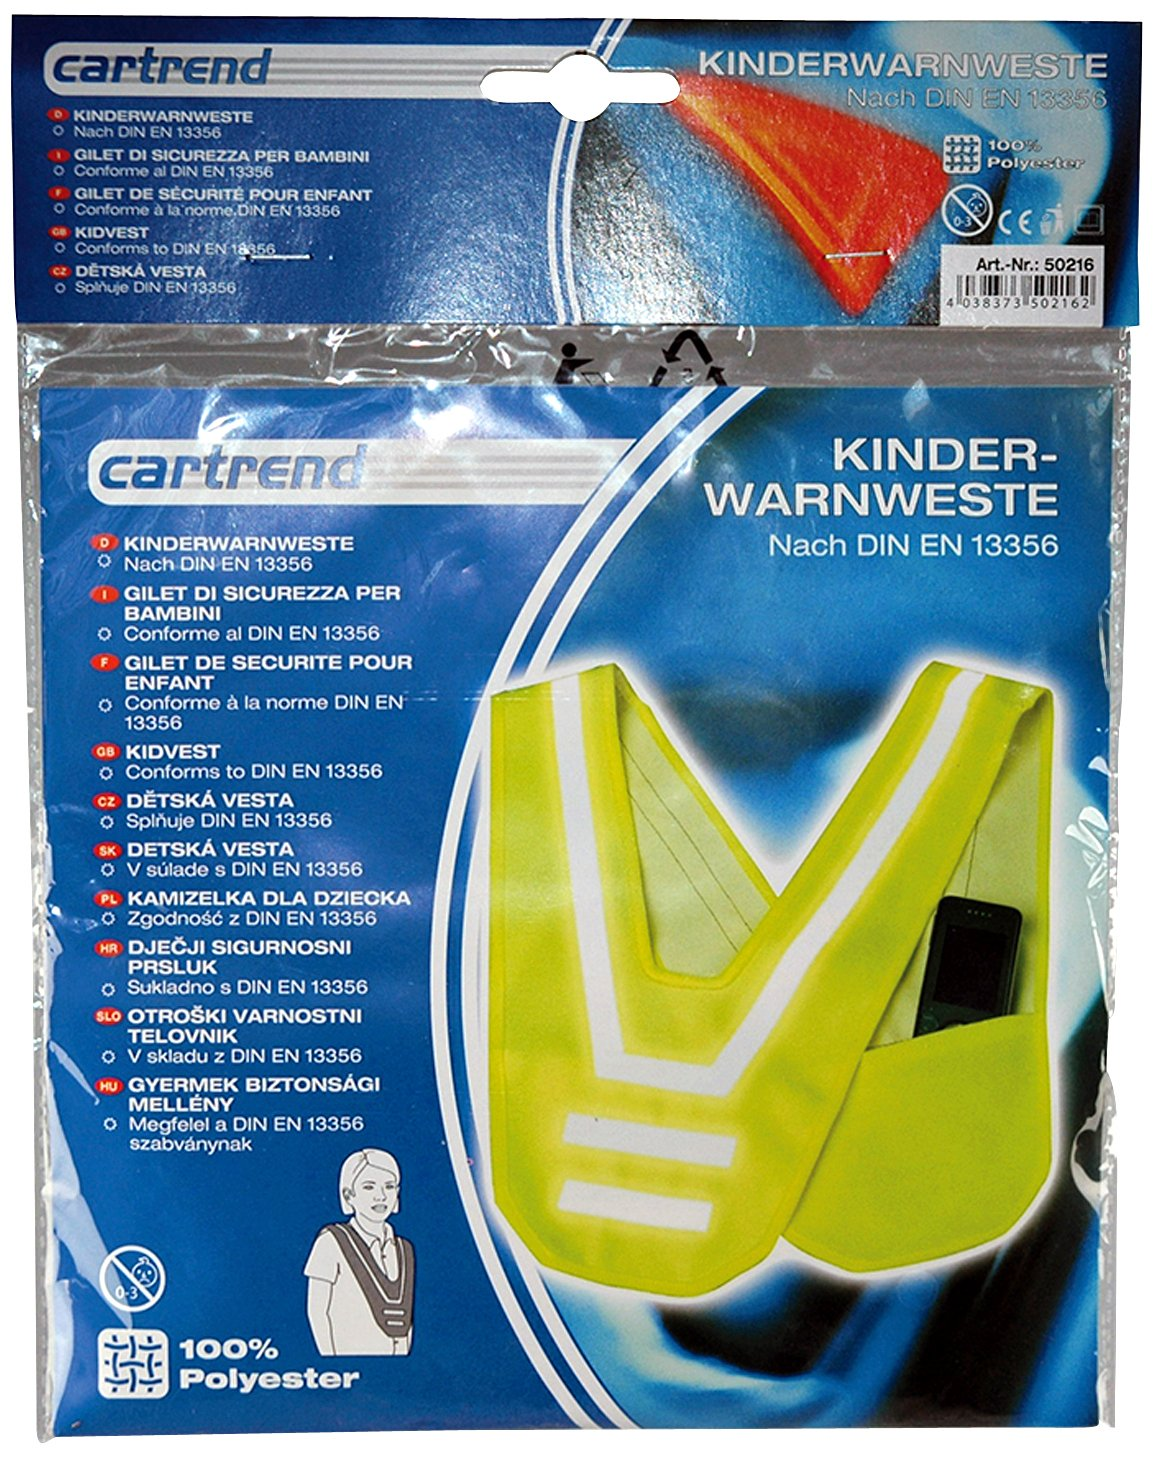 Cartrend 50216 Chaleco de seguridad infantil en forma de V EN 13356